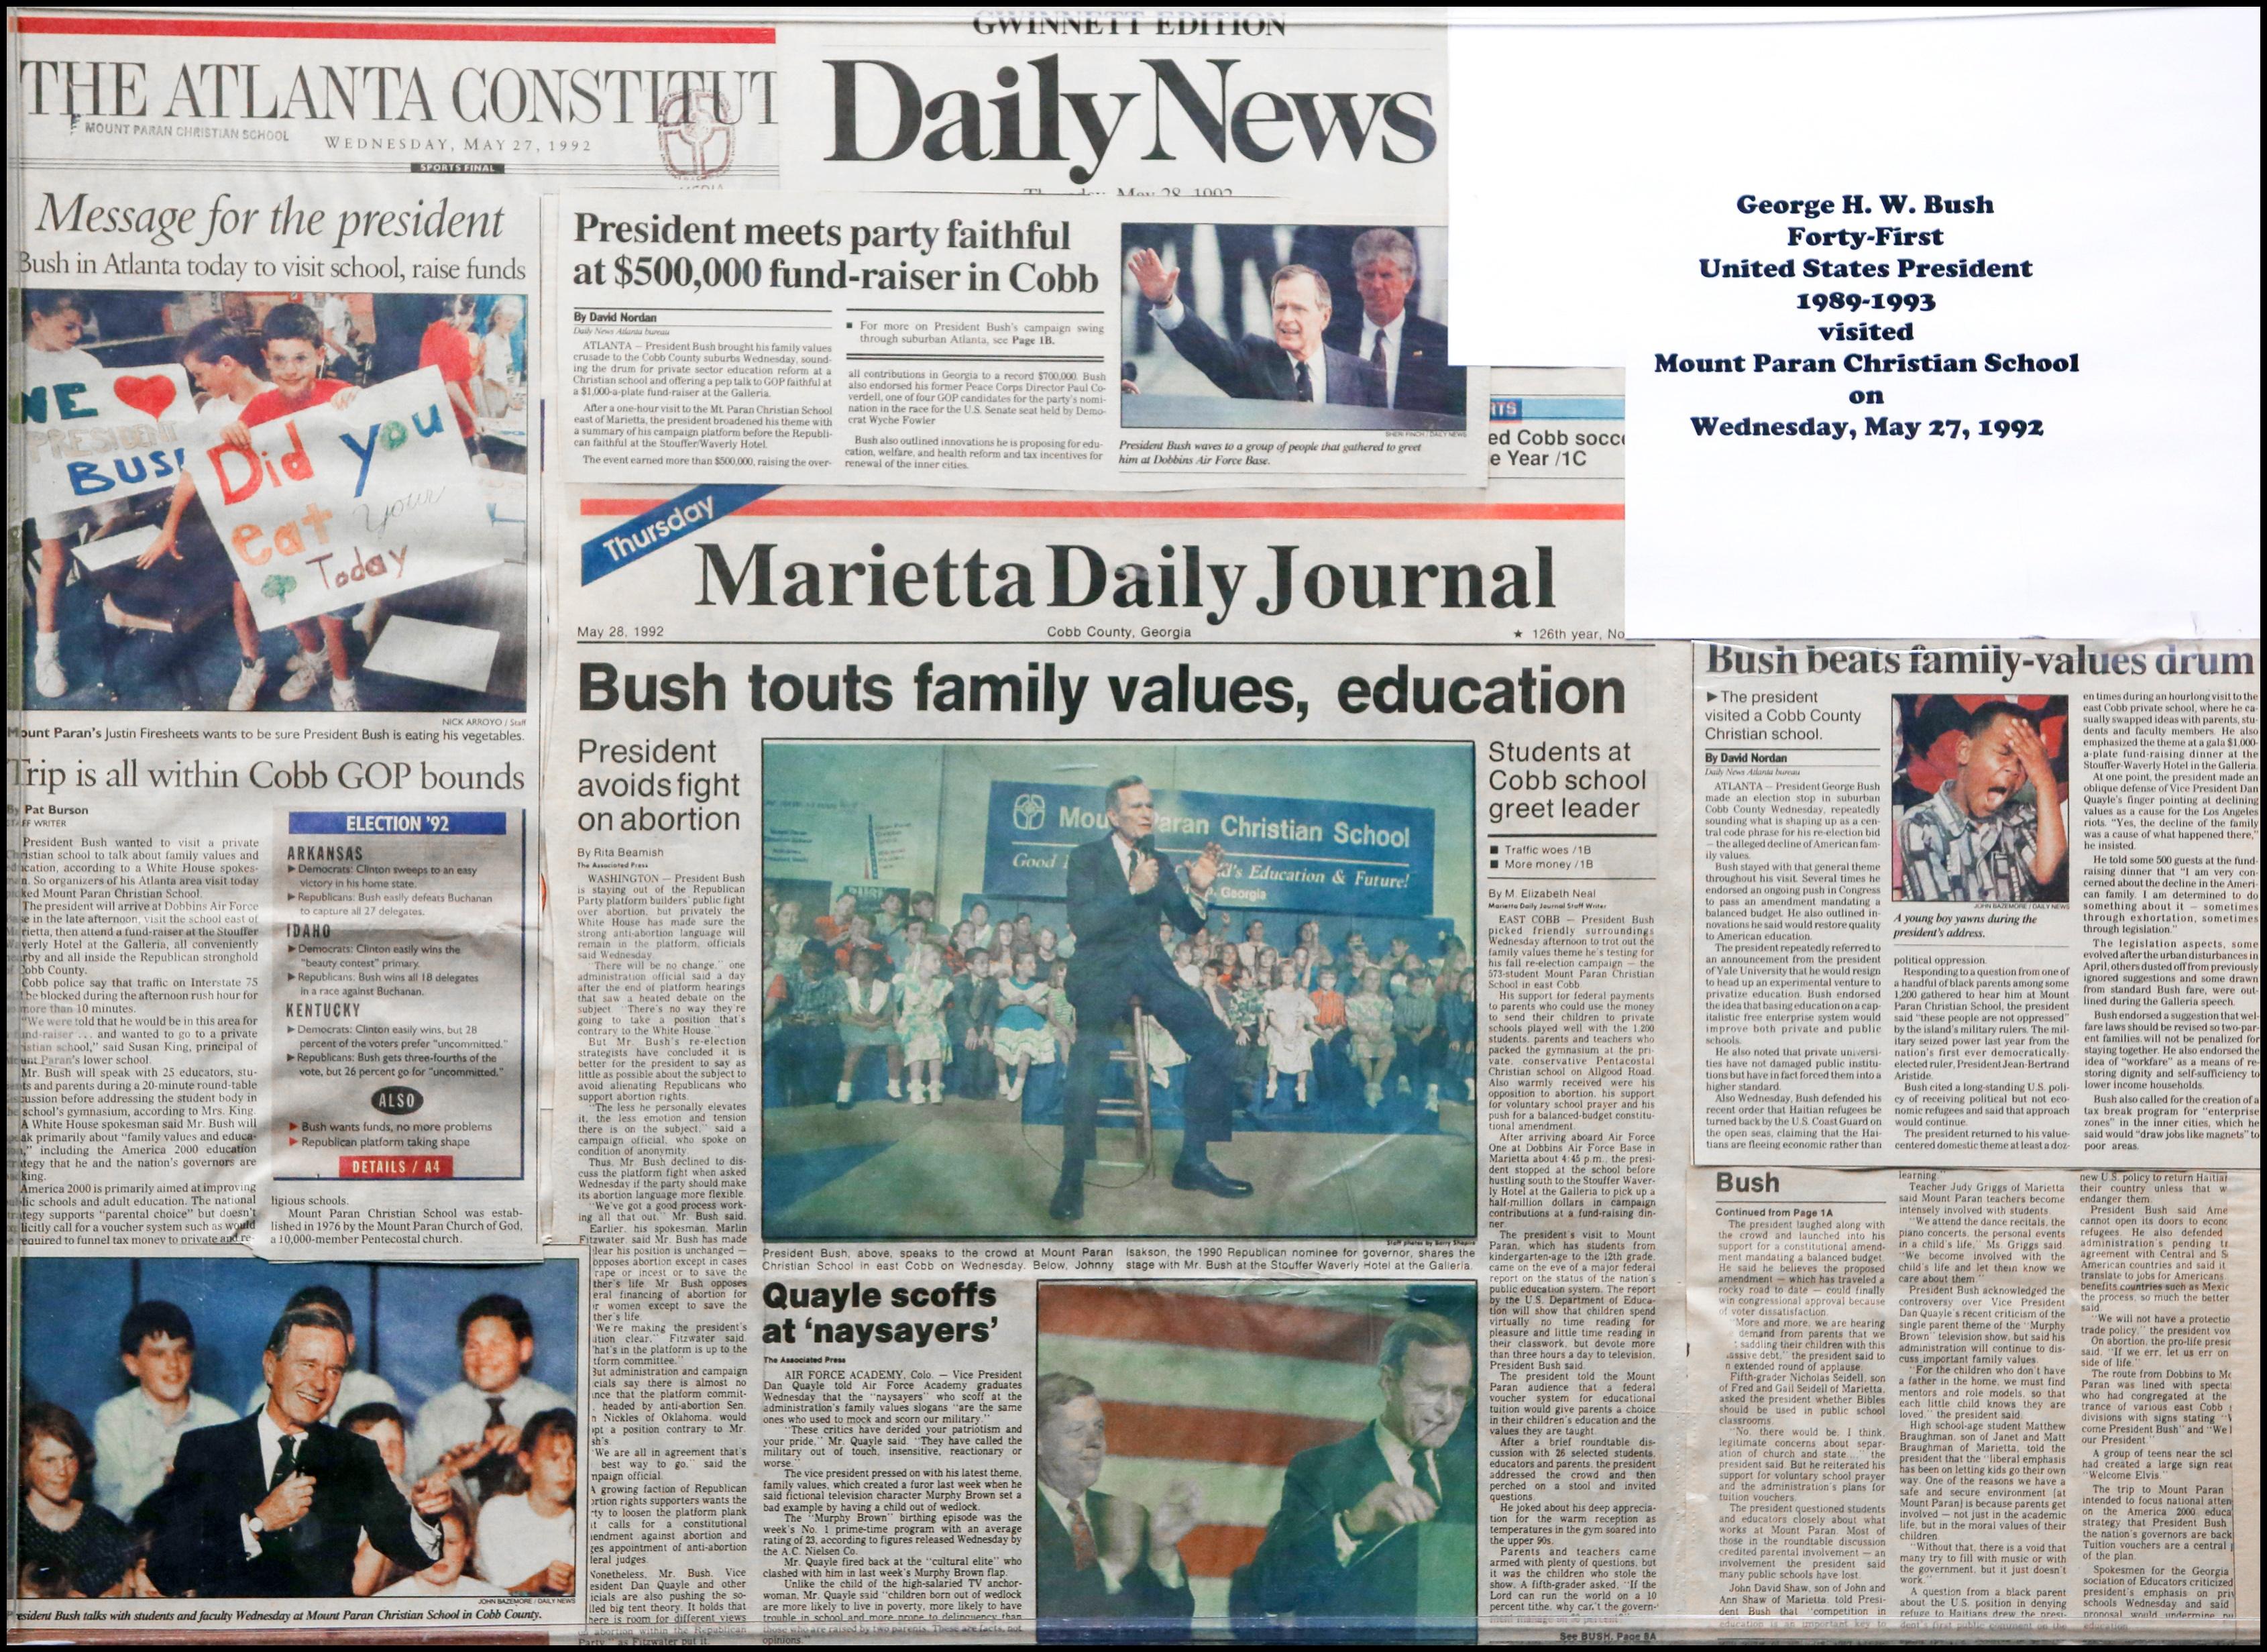 Bush NewspaperClippingsLR3-9892